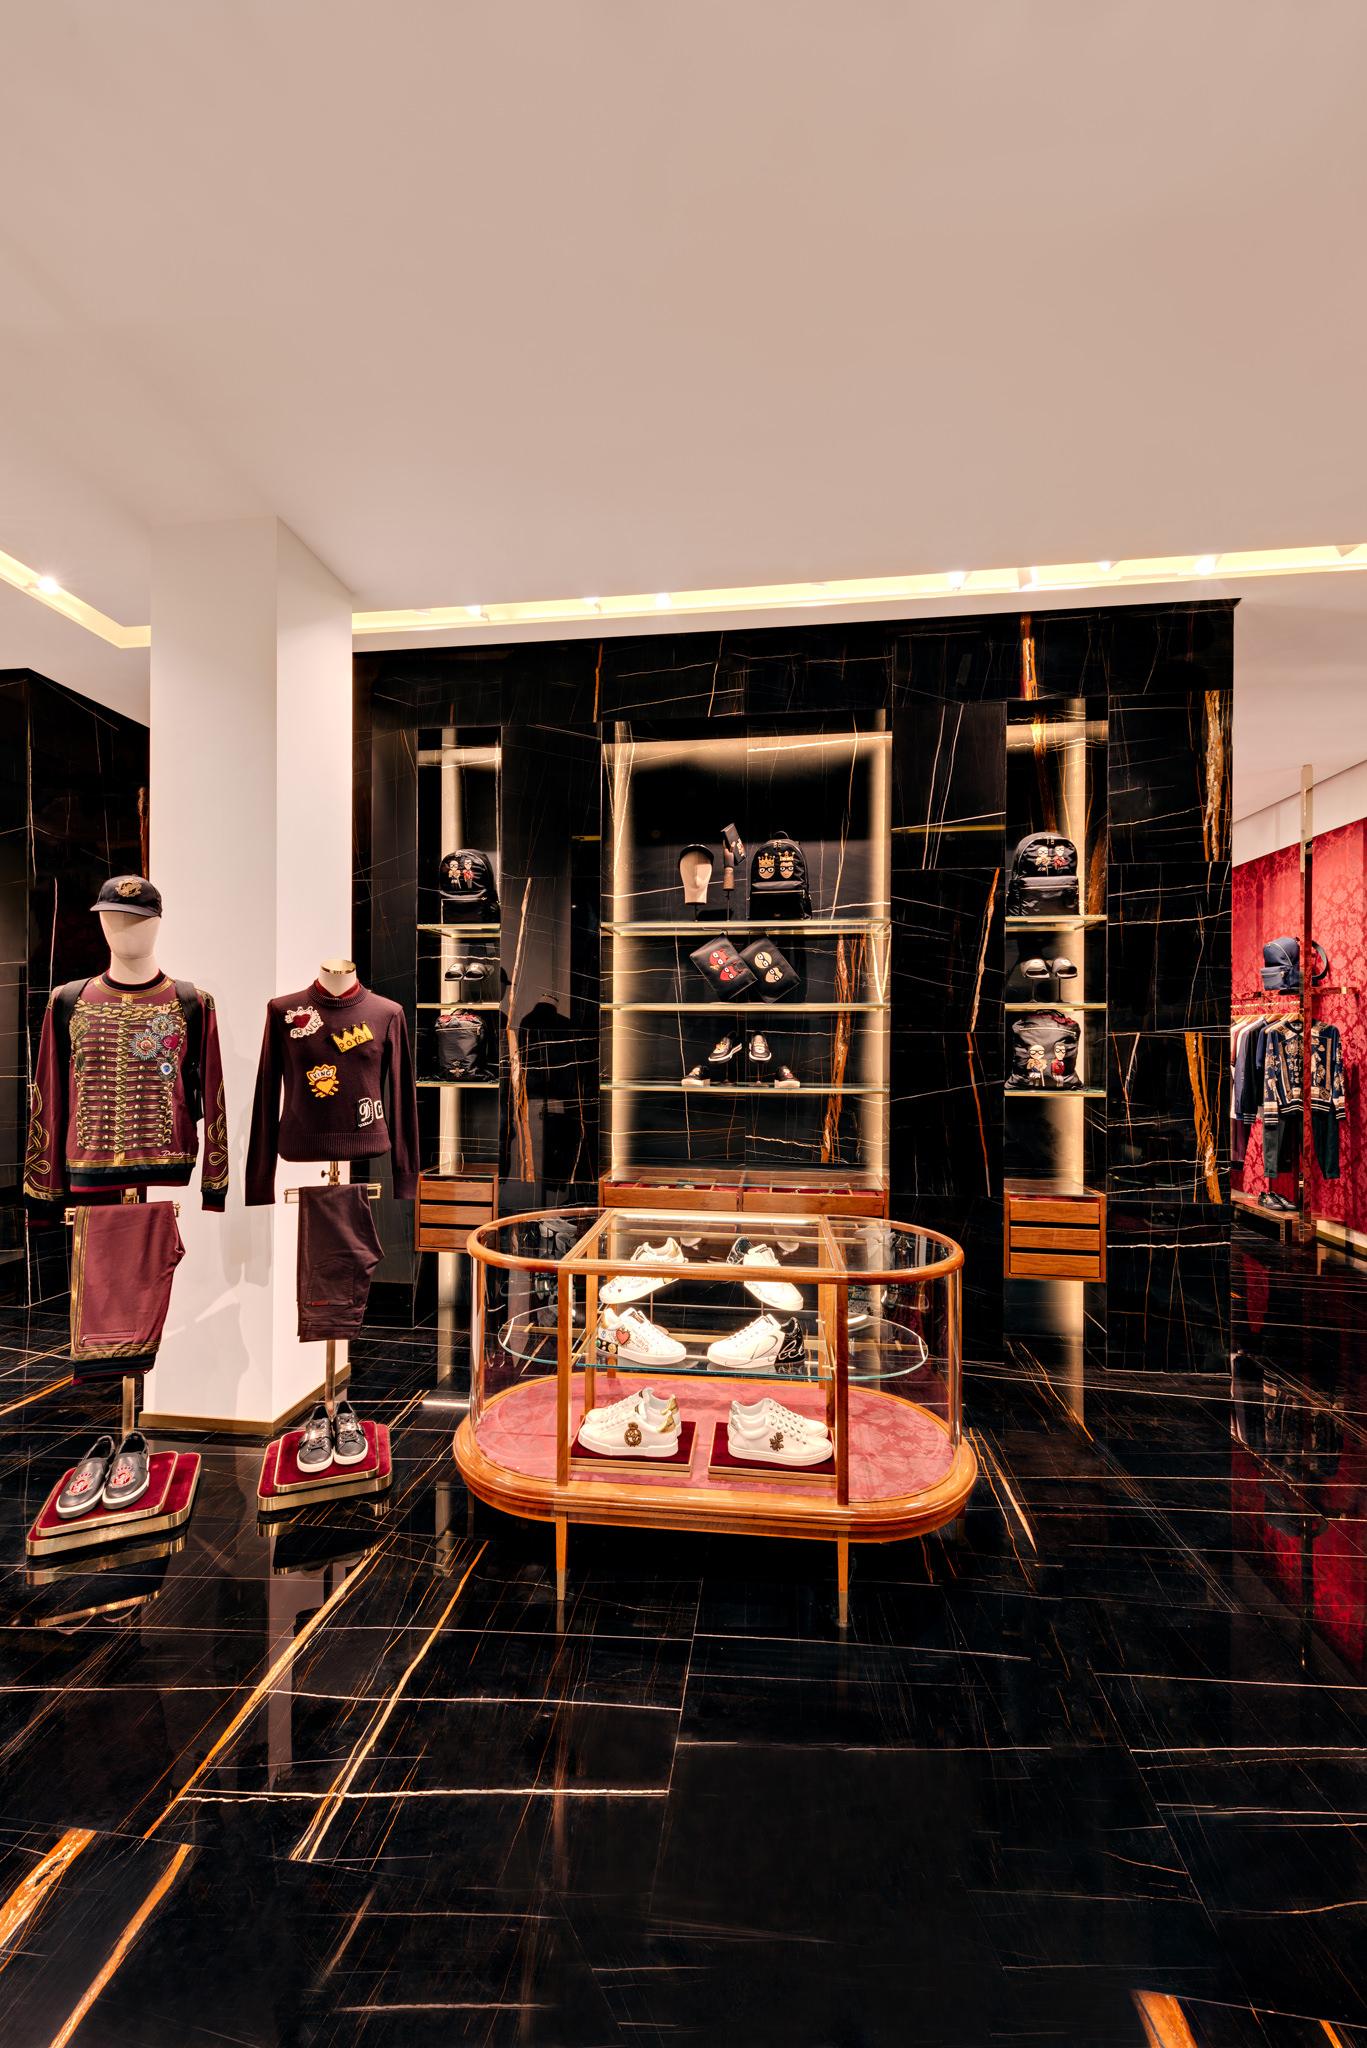 20171011 - Dolce & Gabbana - HCM - Commercial - Interior - Store - Retouch 0181.jpg